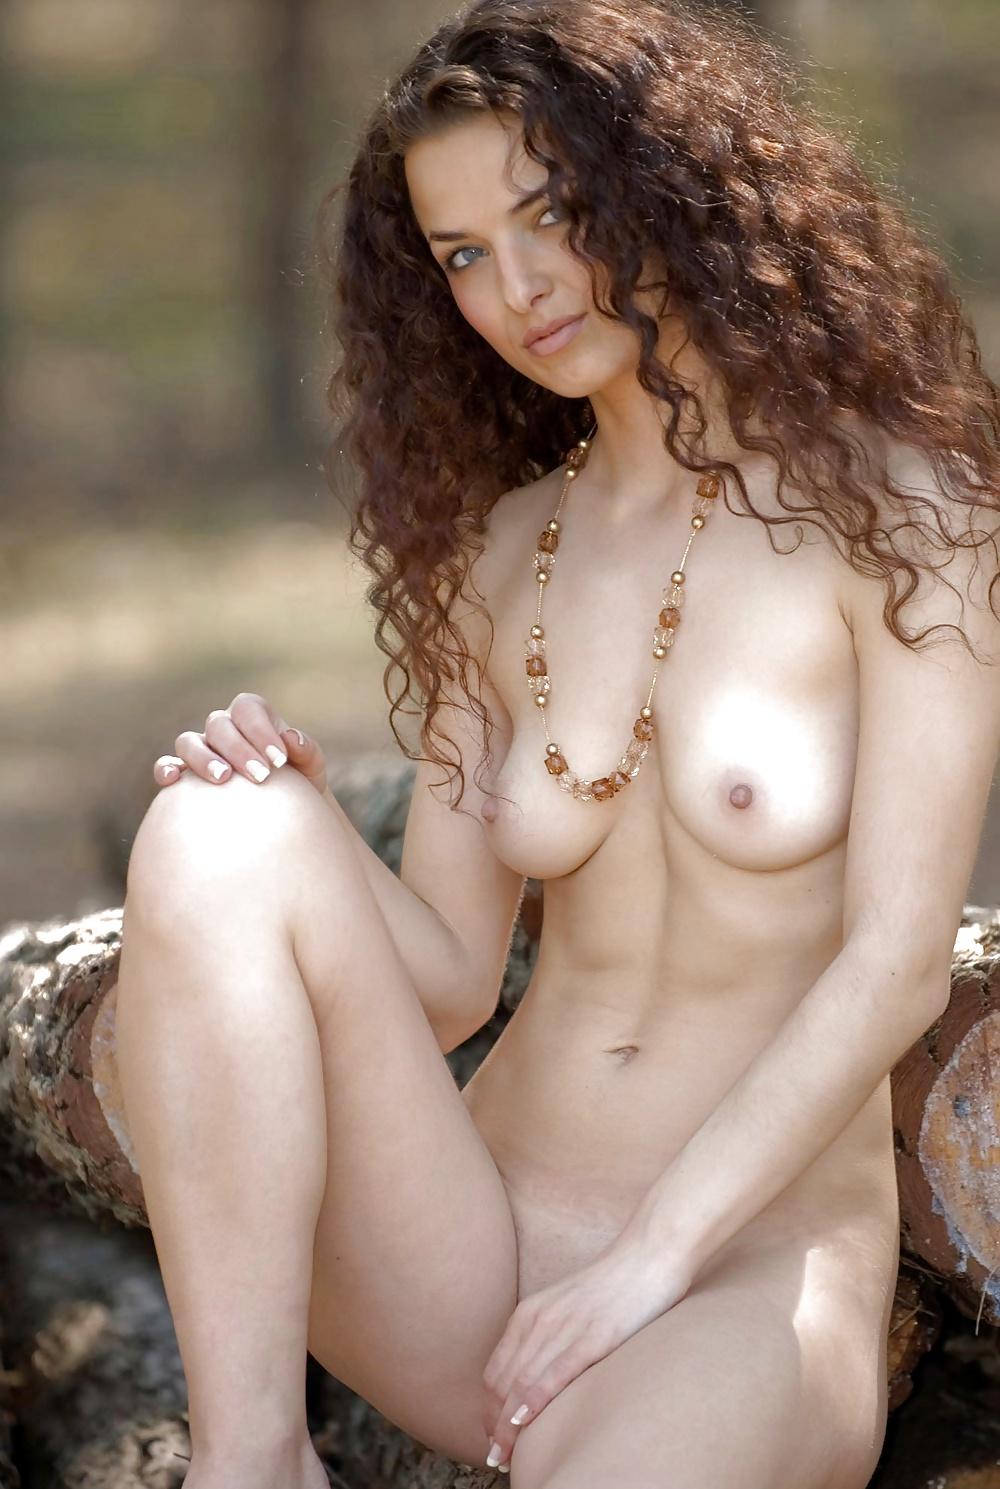 Porno galleries karina hot nude guy doll xxx